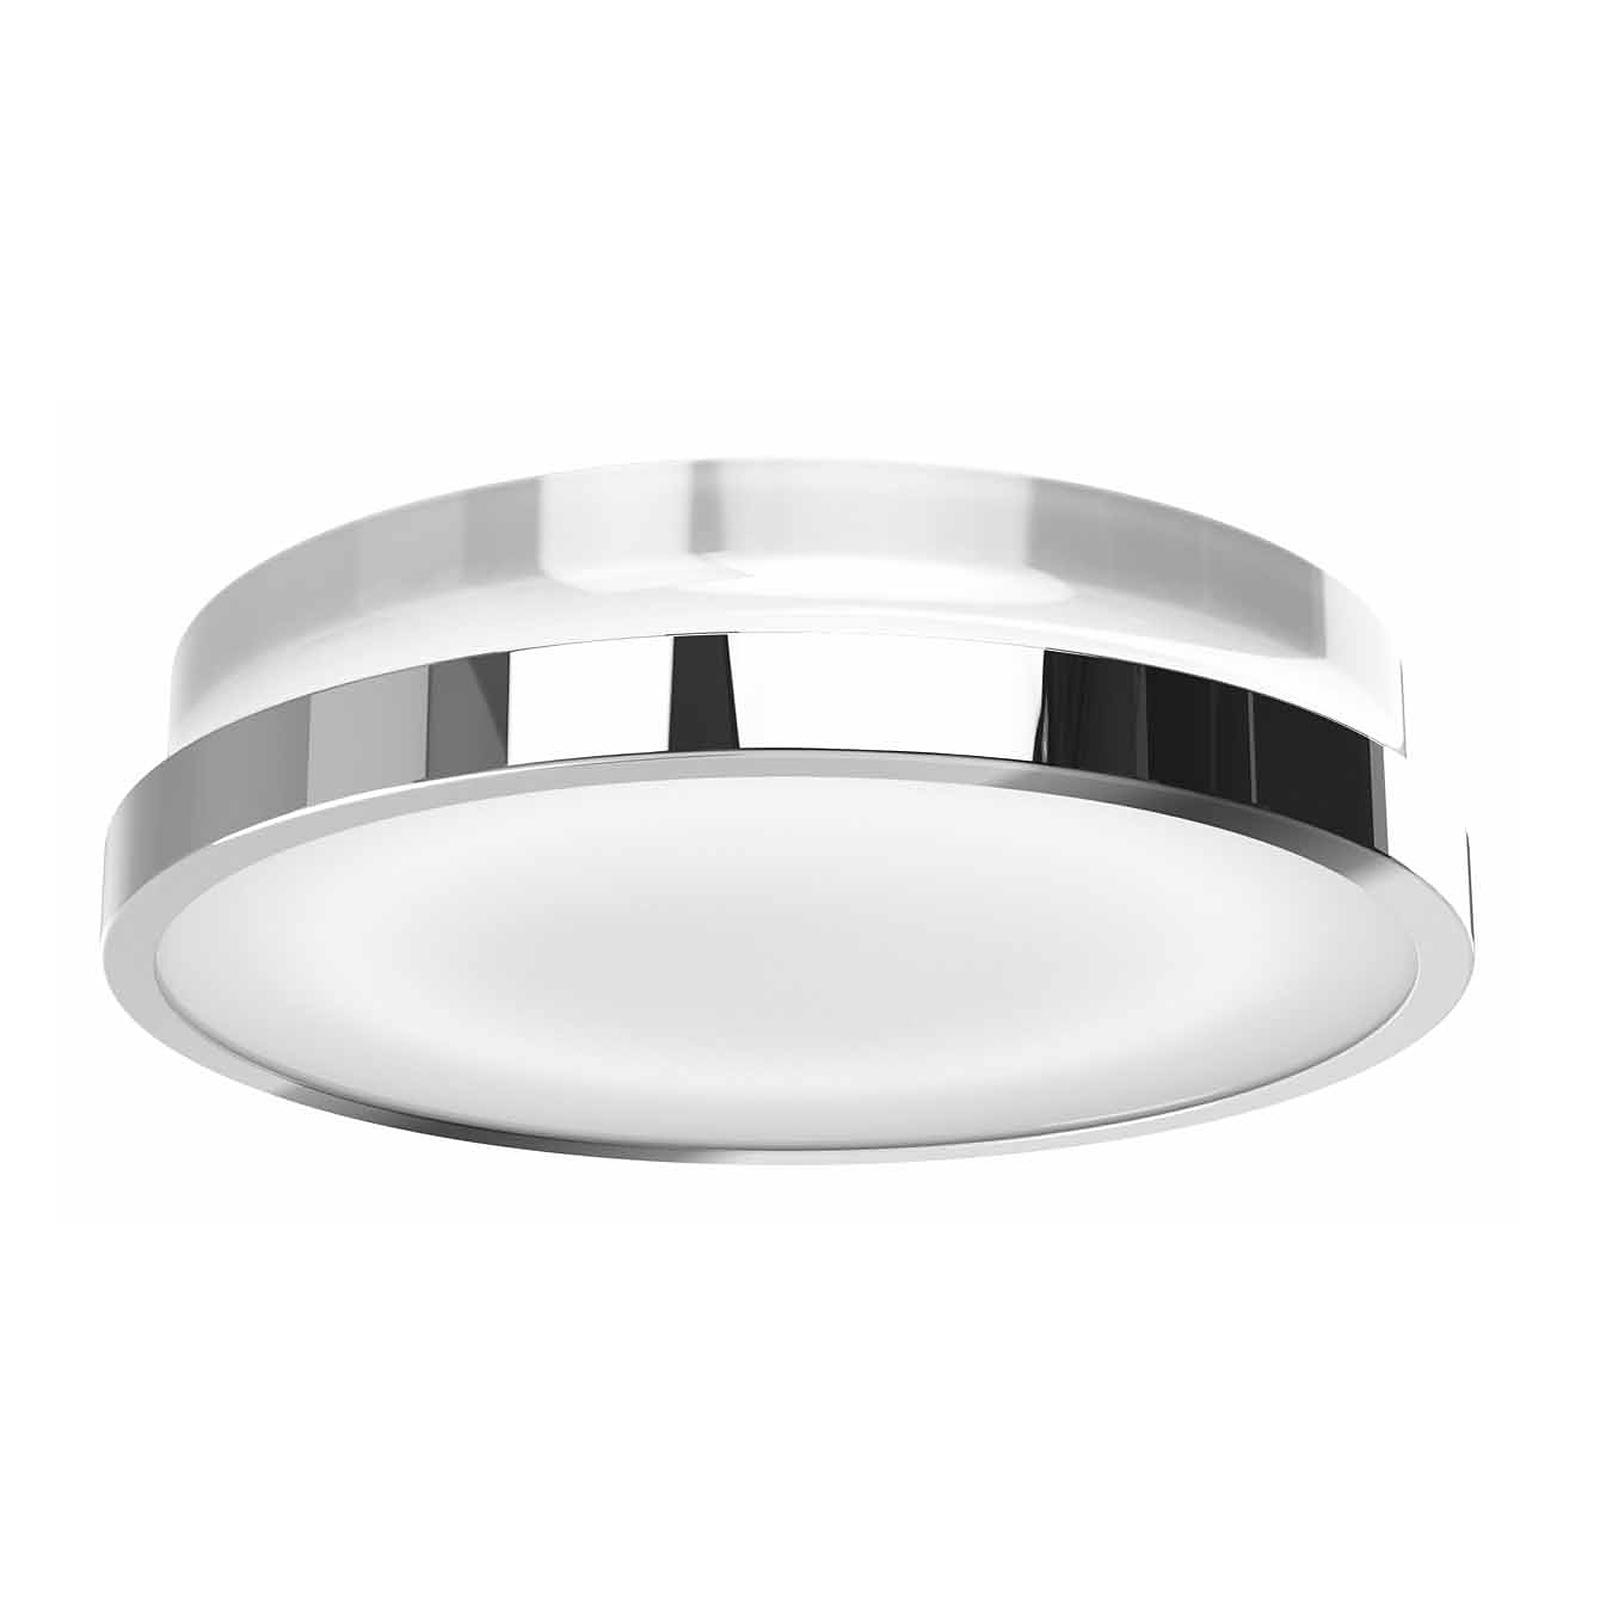 osram manifold sensor led ceiling light 22 watt 930 lumen warm white 3000k ip44 ebay. Black Bedroom Furniture Sets. Home Design Ideas